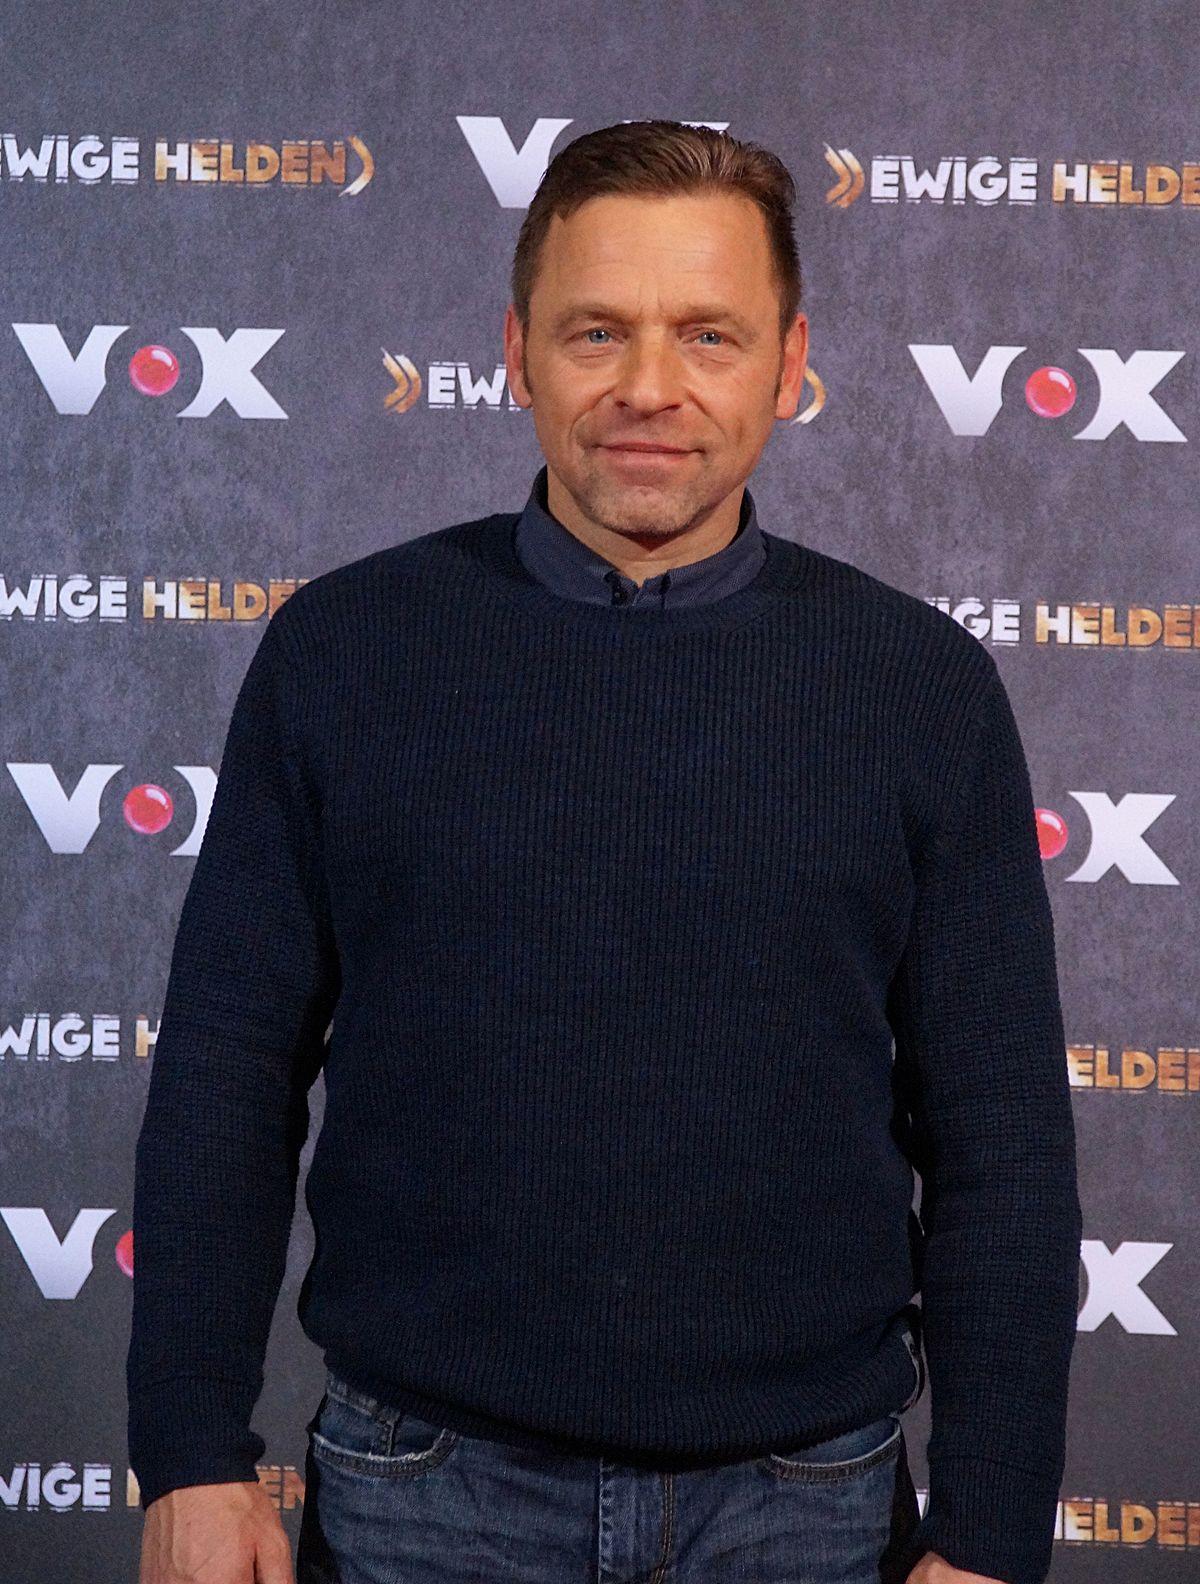 Thomas Hässler